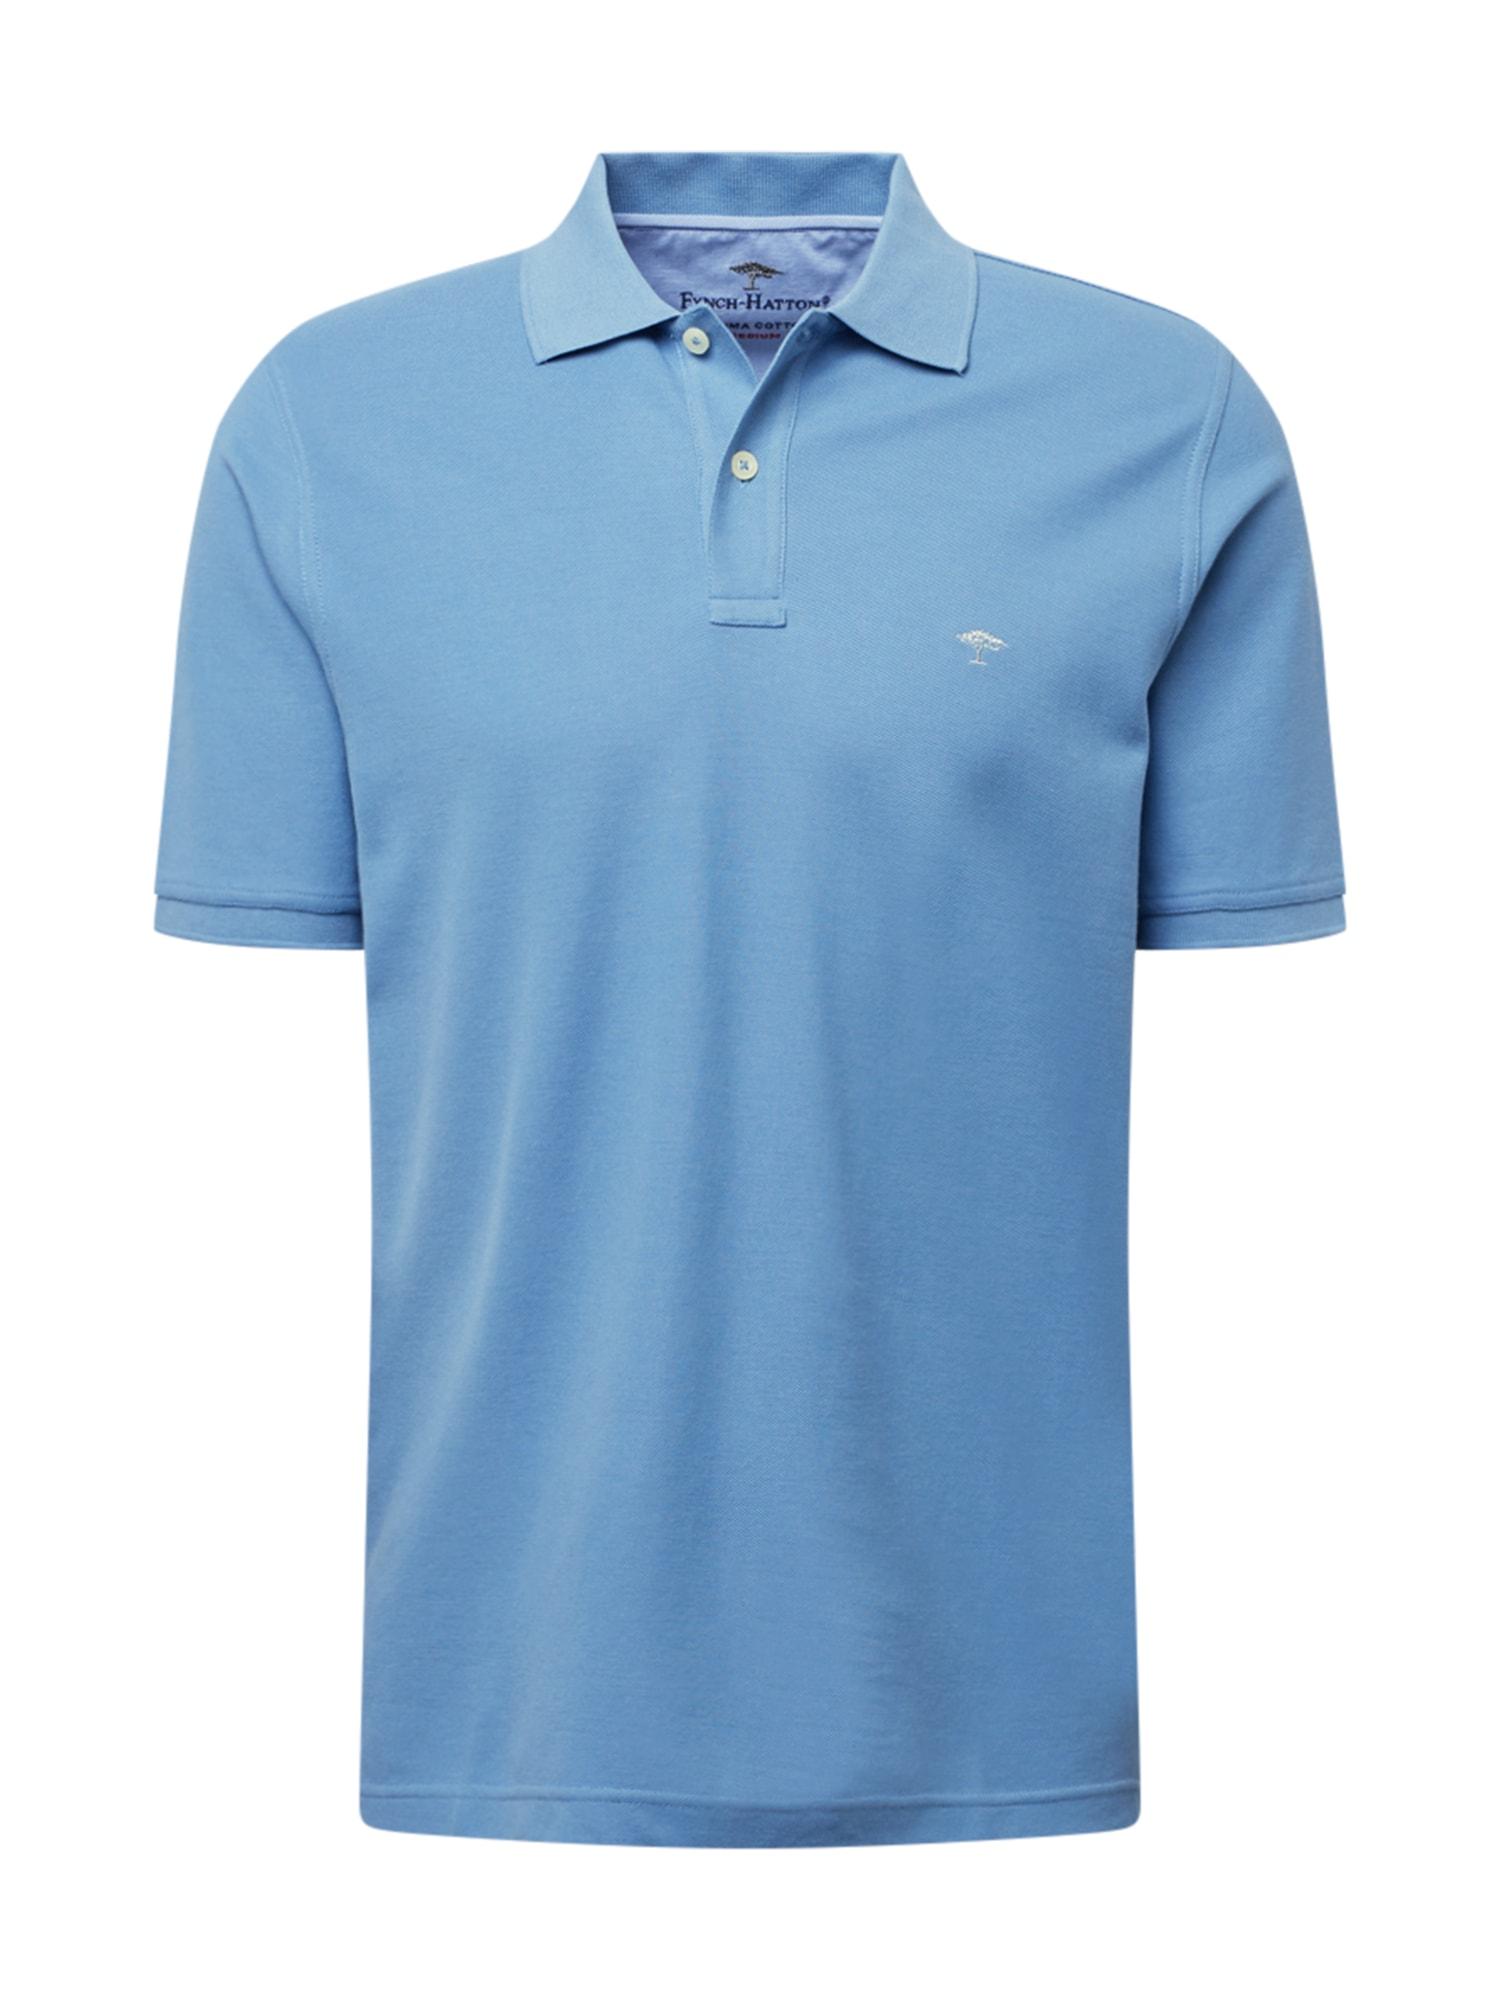 FYNCH-HATTON Marškinėliai mėlyna dūmų spalva